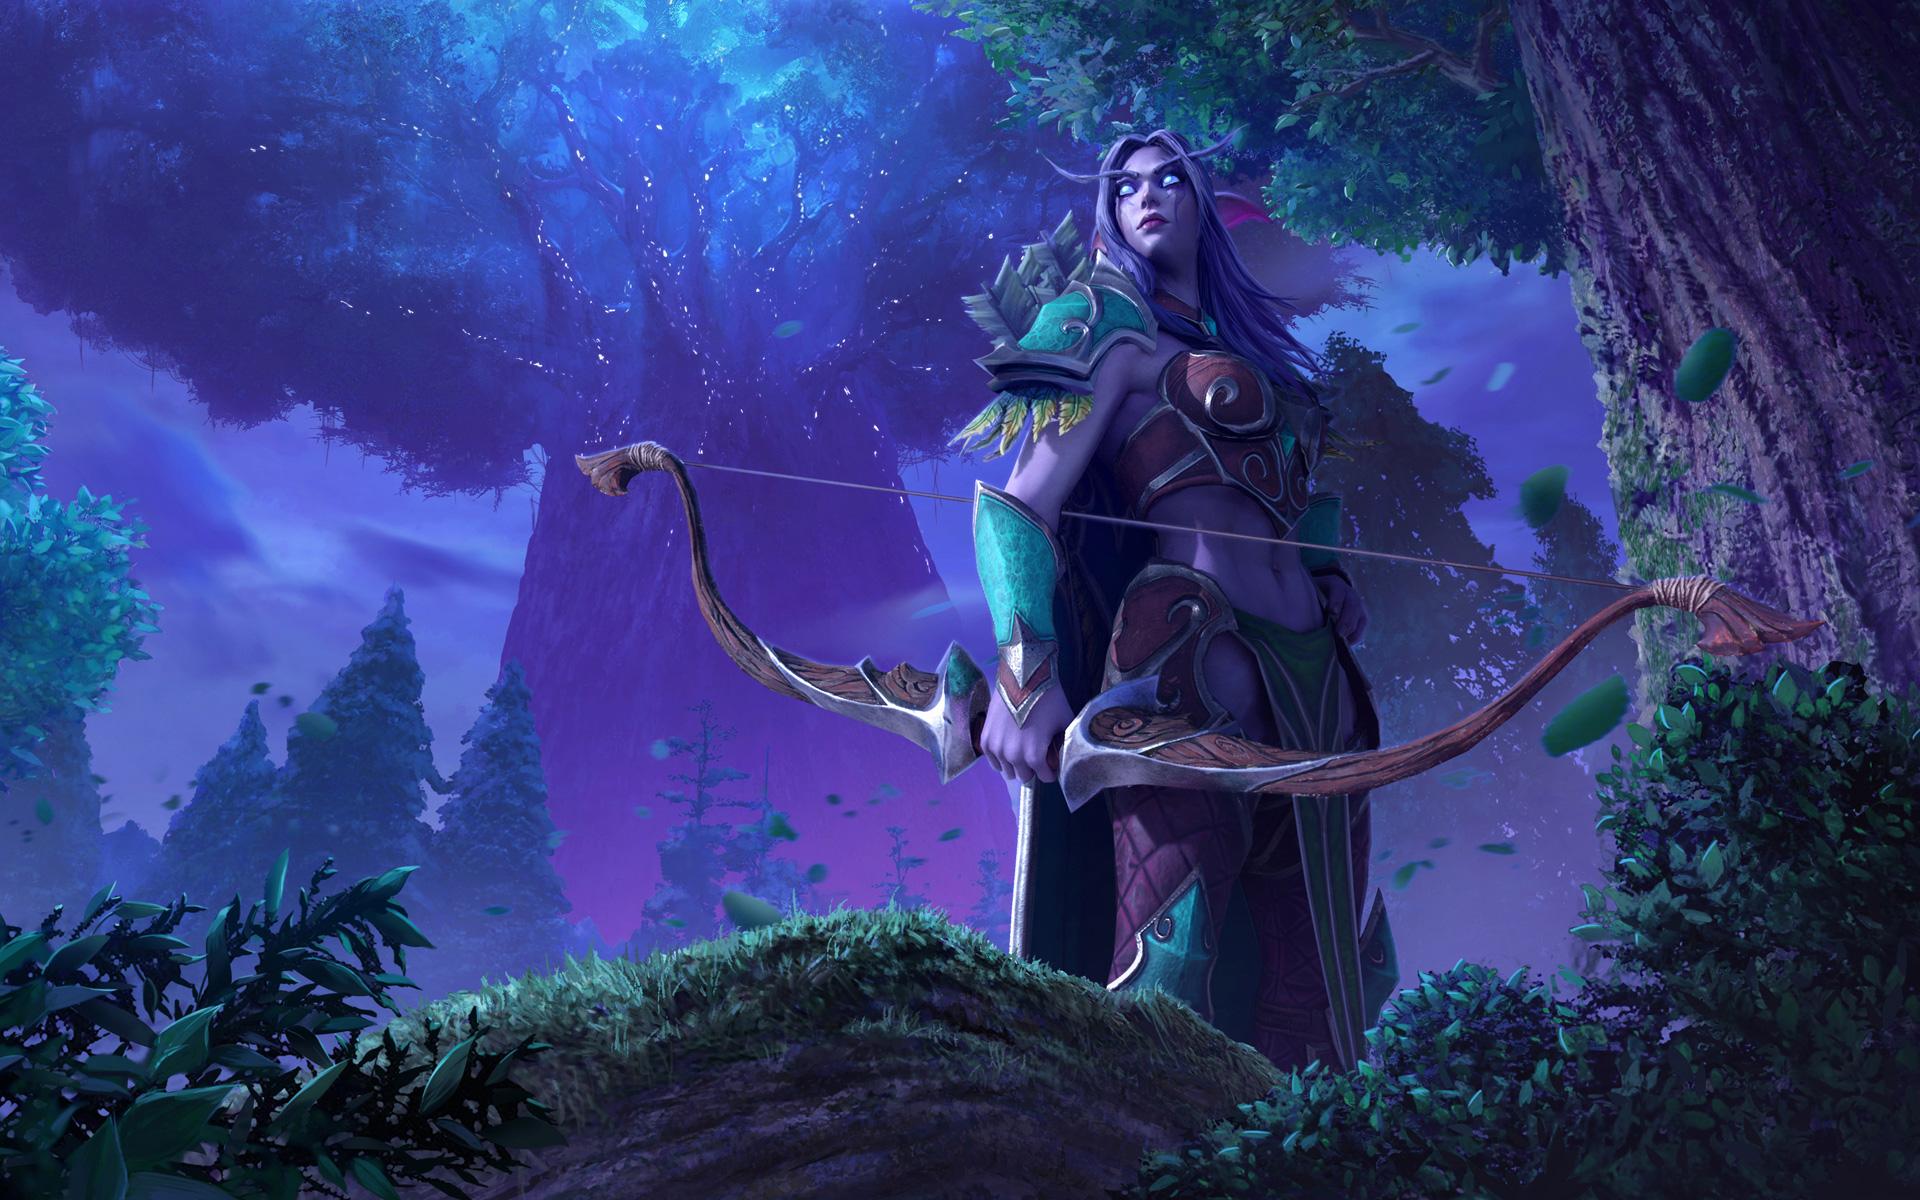 Free Warcraft III Wallpaper in 1920x1200